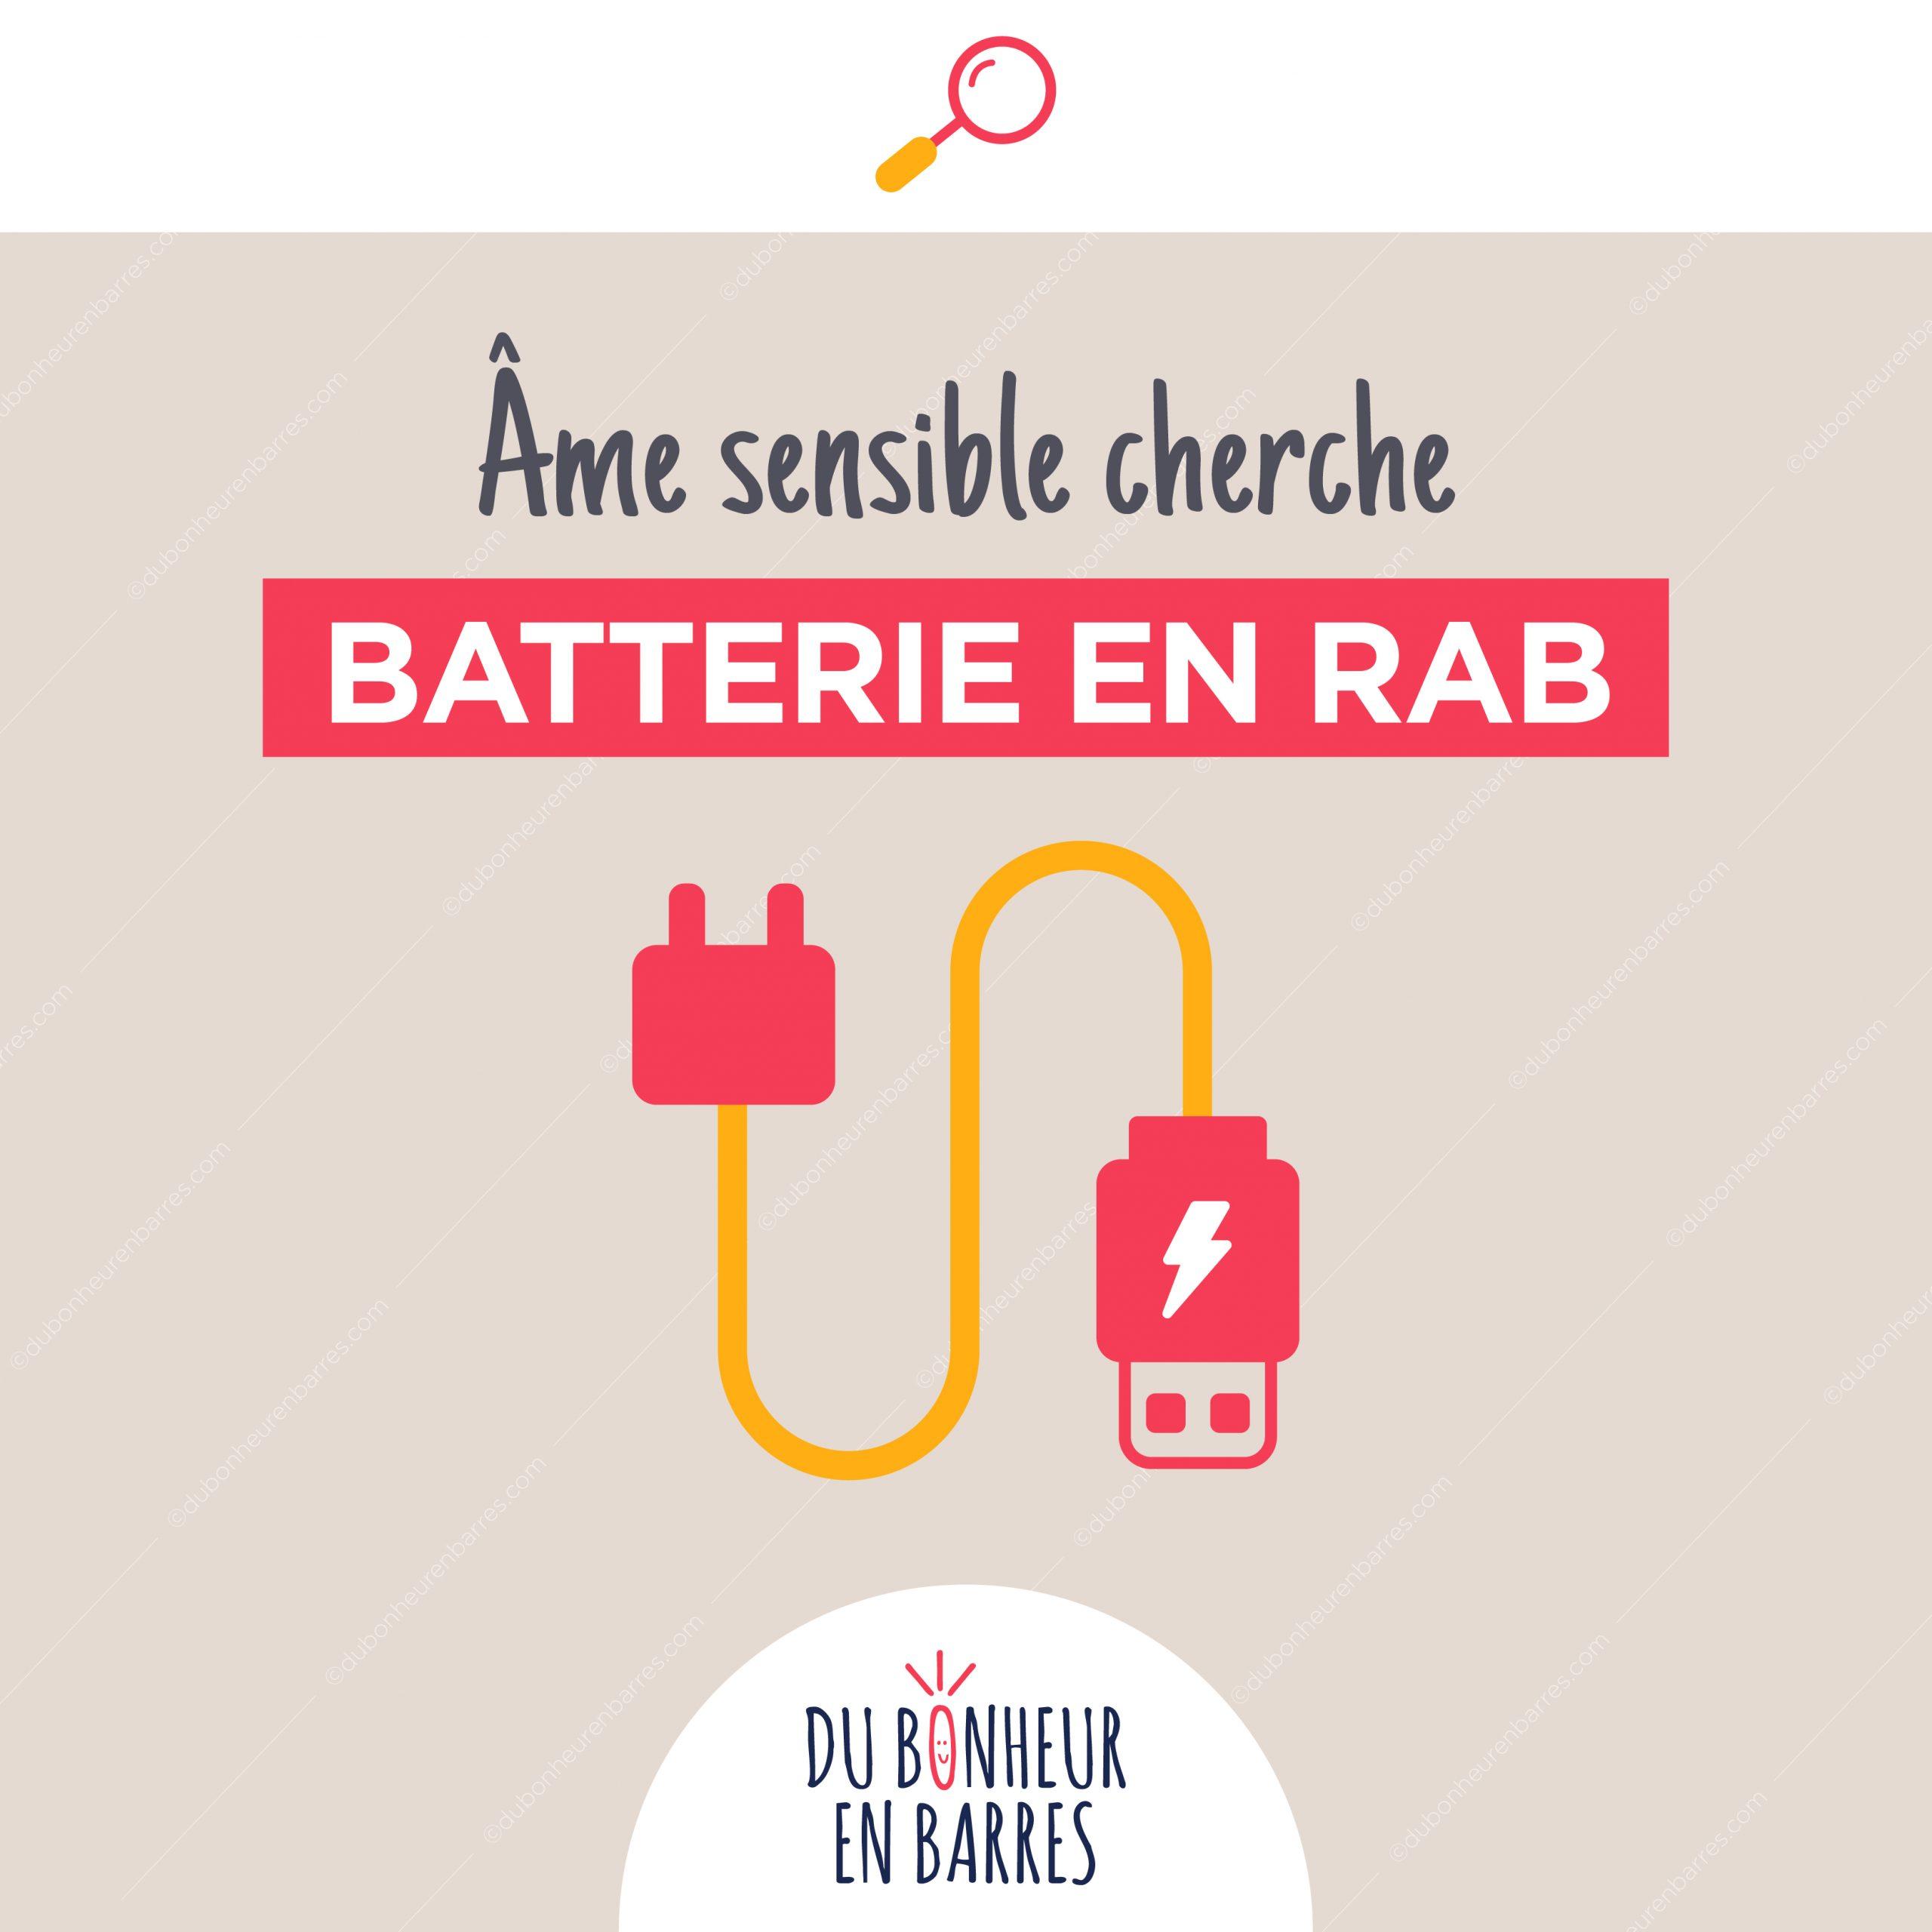 Hypersensible cherche batterie en RAB